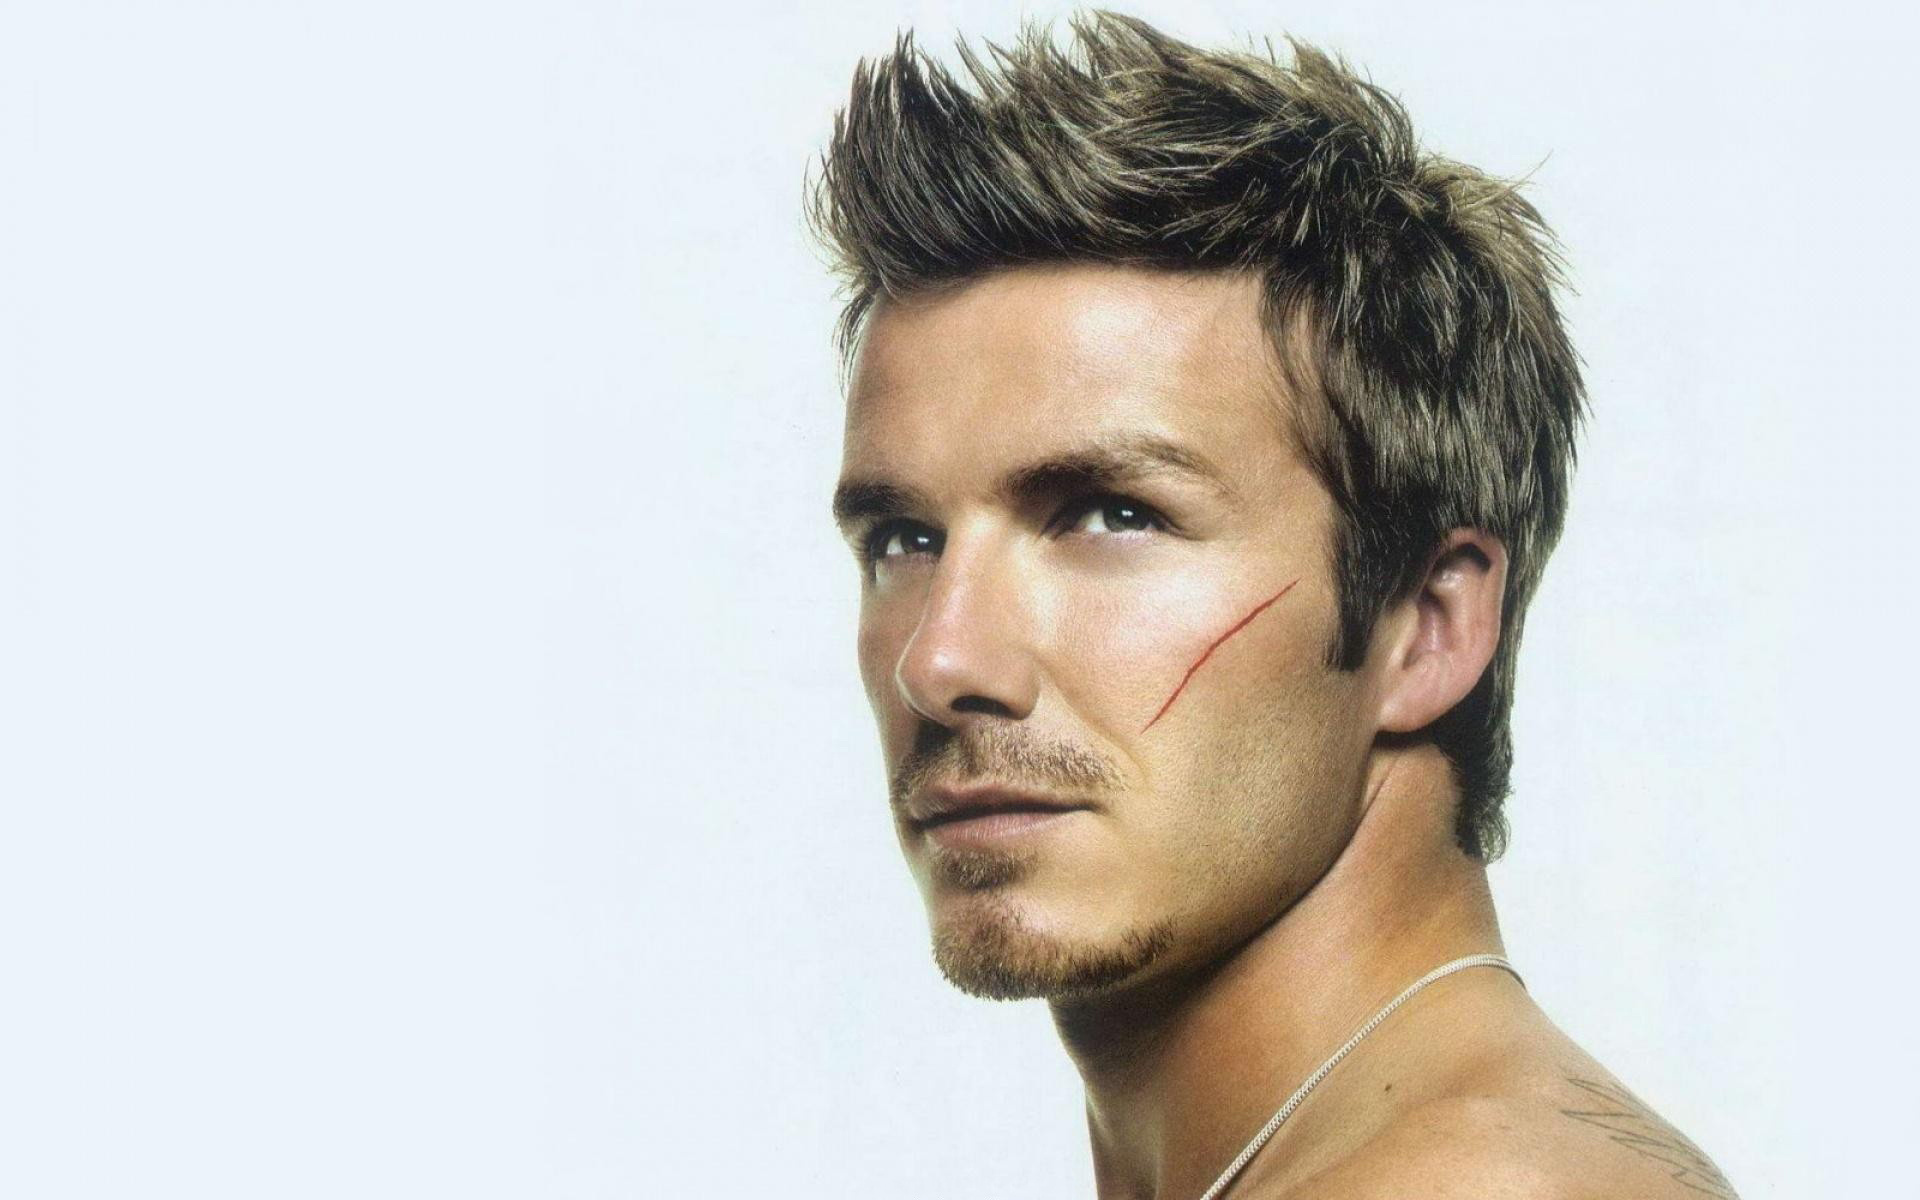 David Beckham Hairstyle 2563